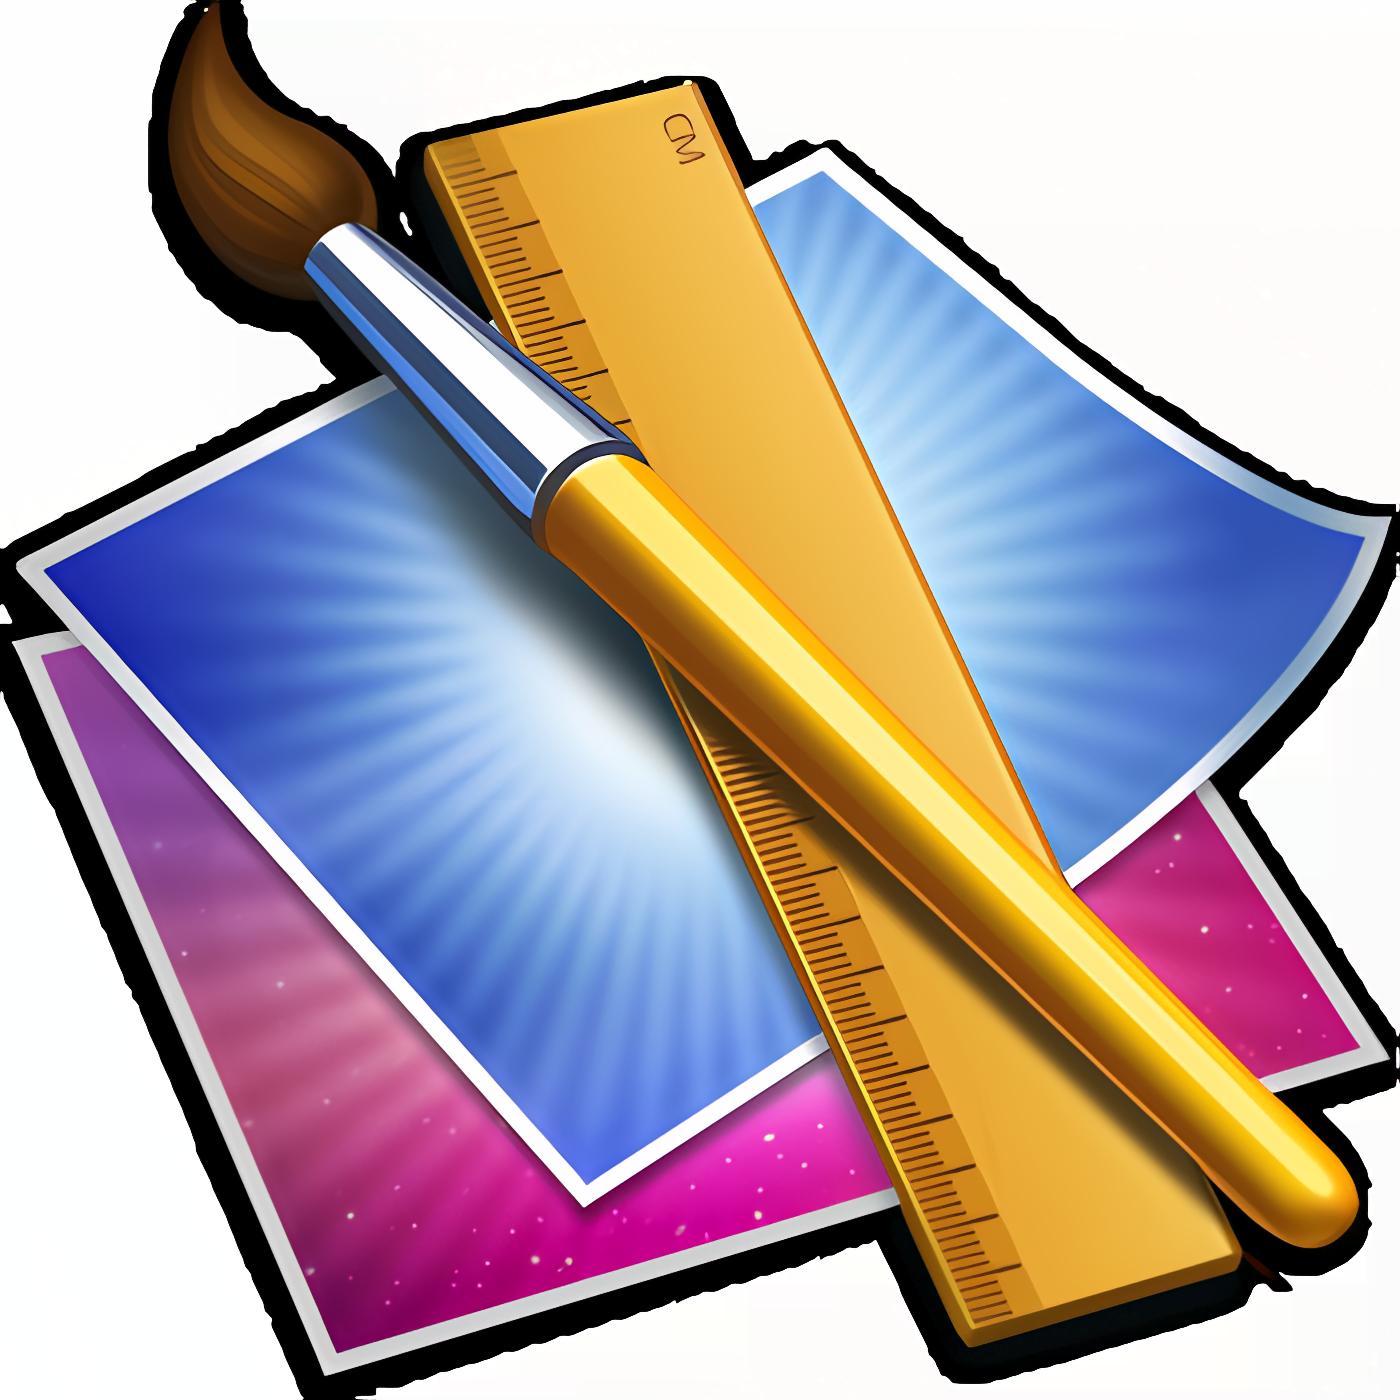 iMage Tools 1.0.16